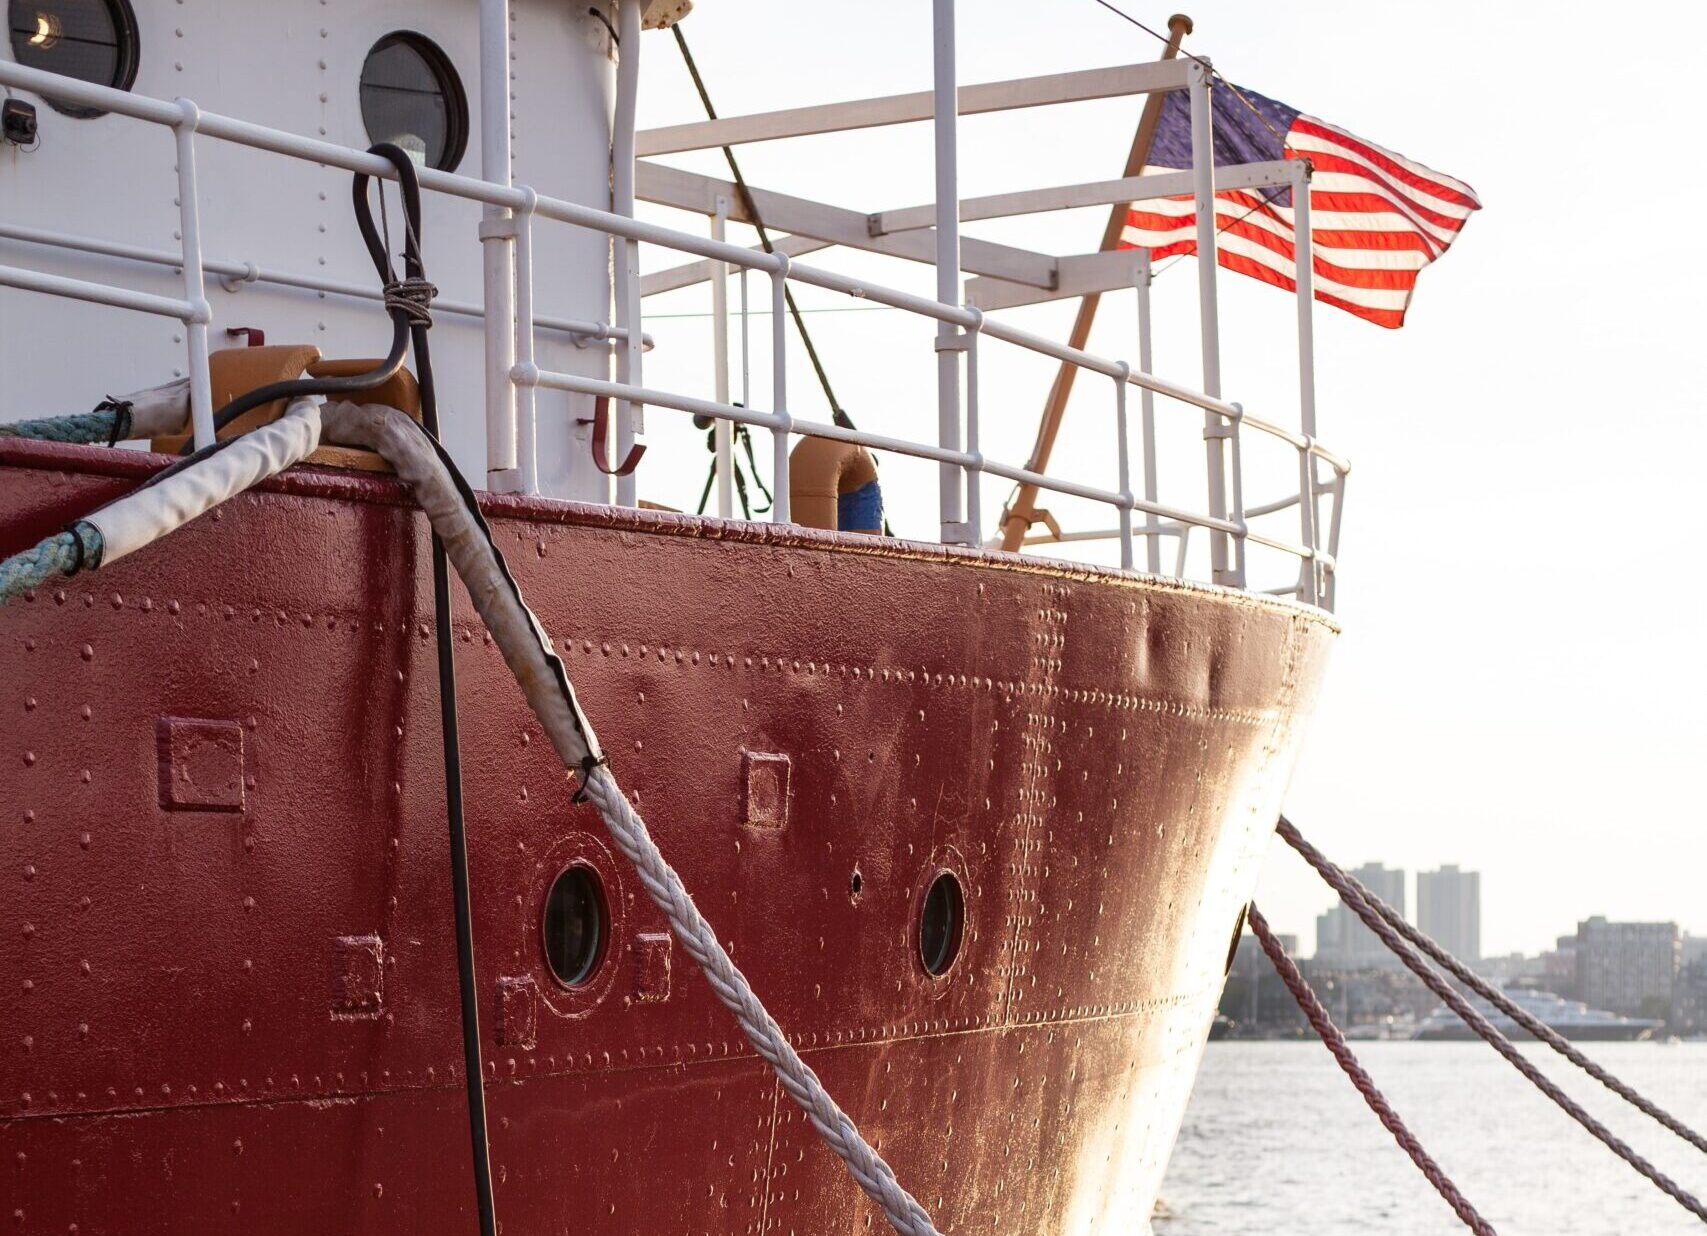 CMS for Passenger Information on ferries in Boston